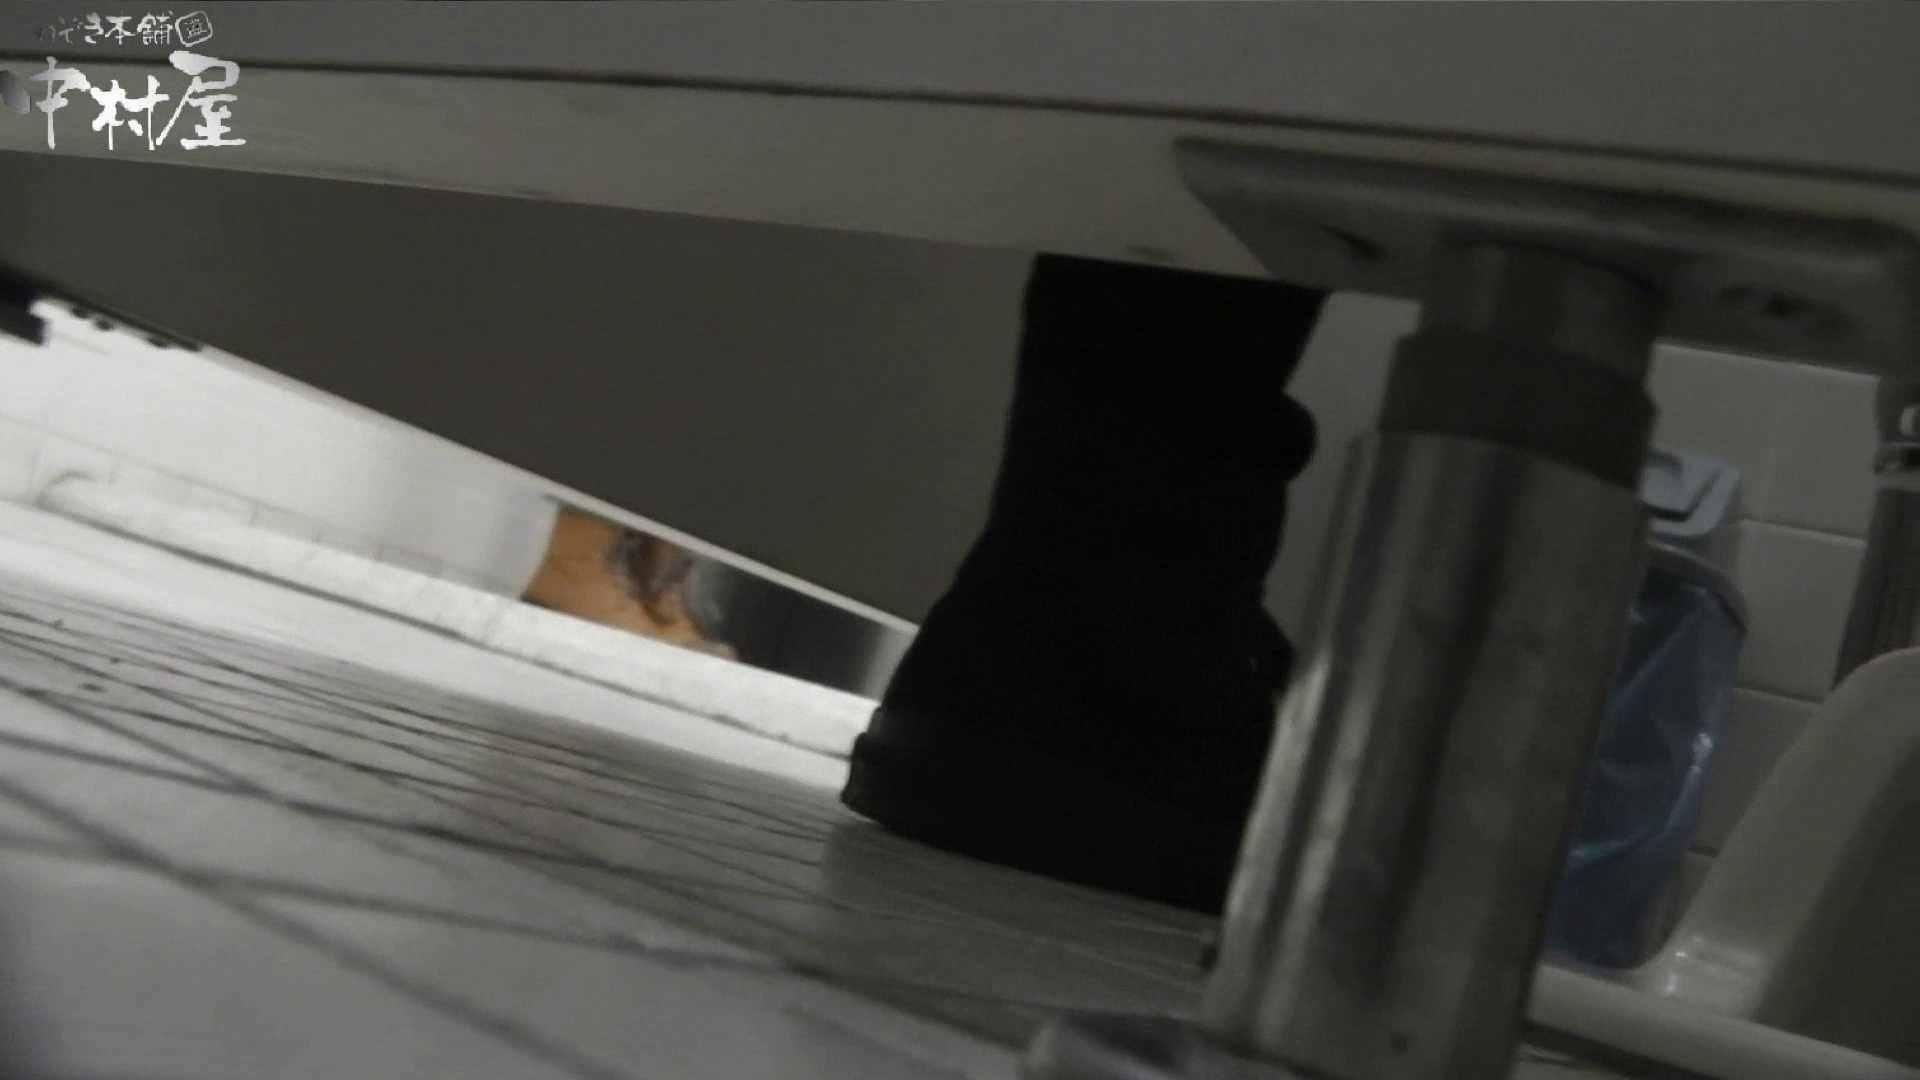 vol.34 命がけ潜伏洗面所! アソコの毛が長髪な件 後編 洗面所 盗撮エロ画像 107画像 42